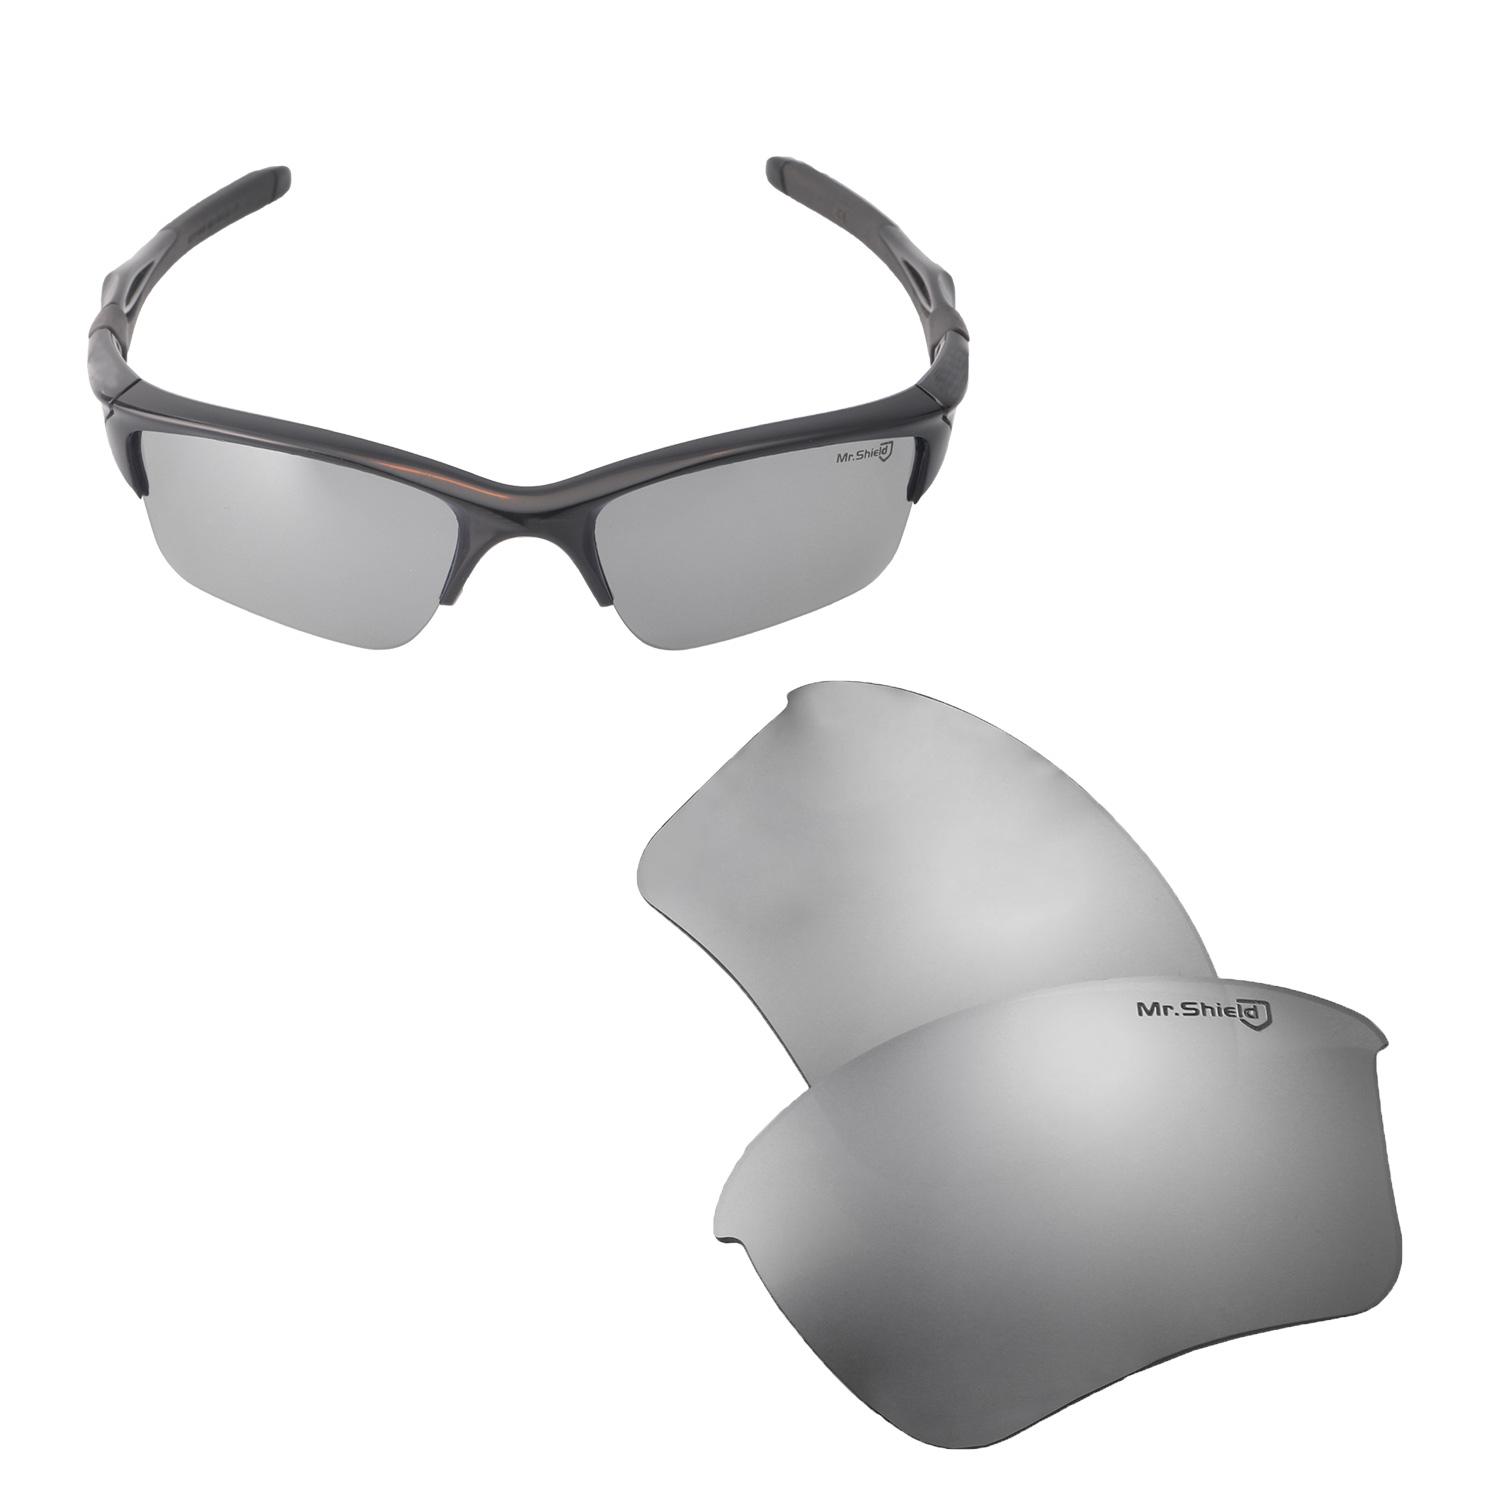 fdbd5bce5c8 Walleva Mr. Shield Polarized Titanium Lenses for Oakley Half Jacket 2.0 XL  x1  Walleva Microfiber Lens Cleaning Liquid x1. main image